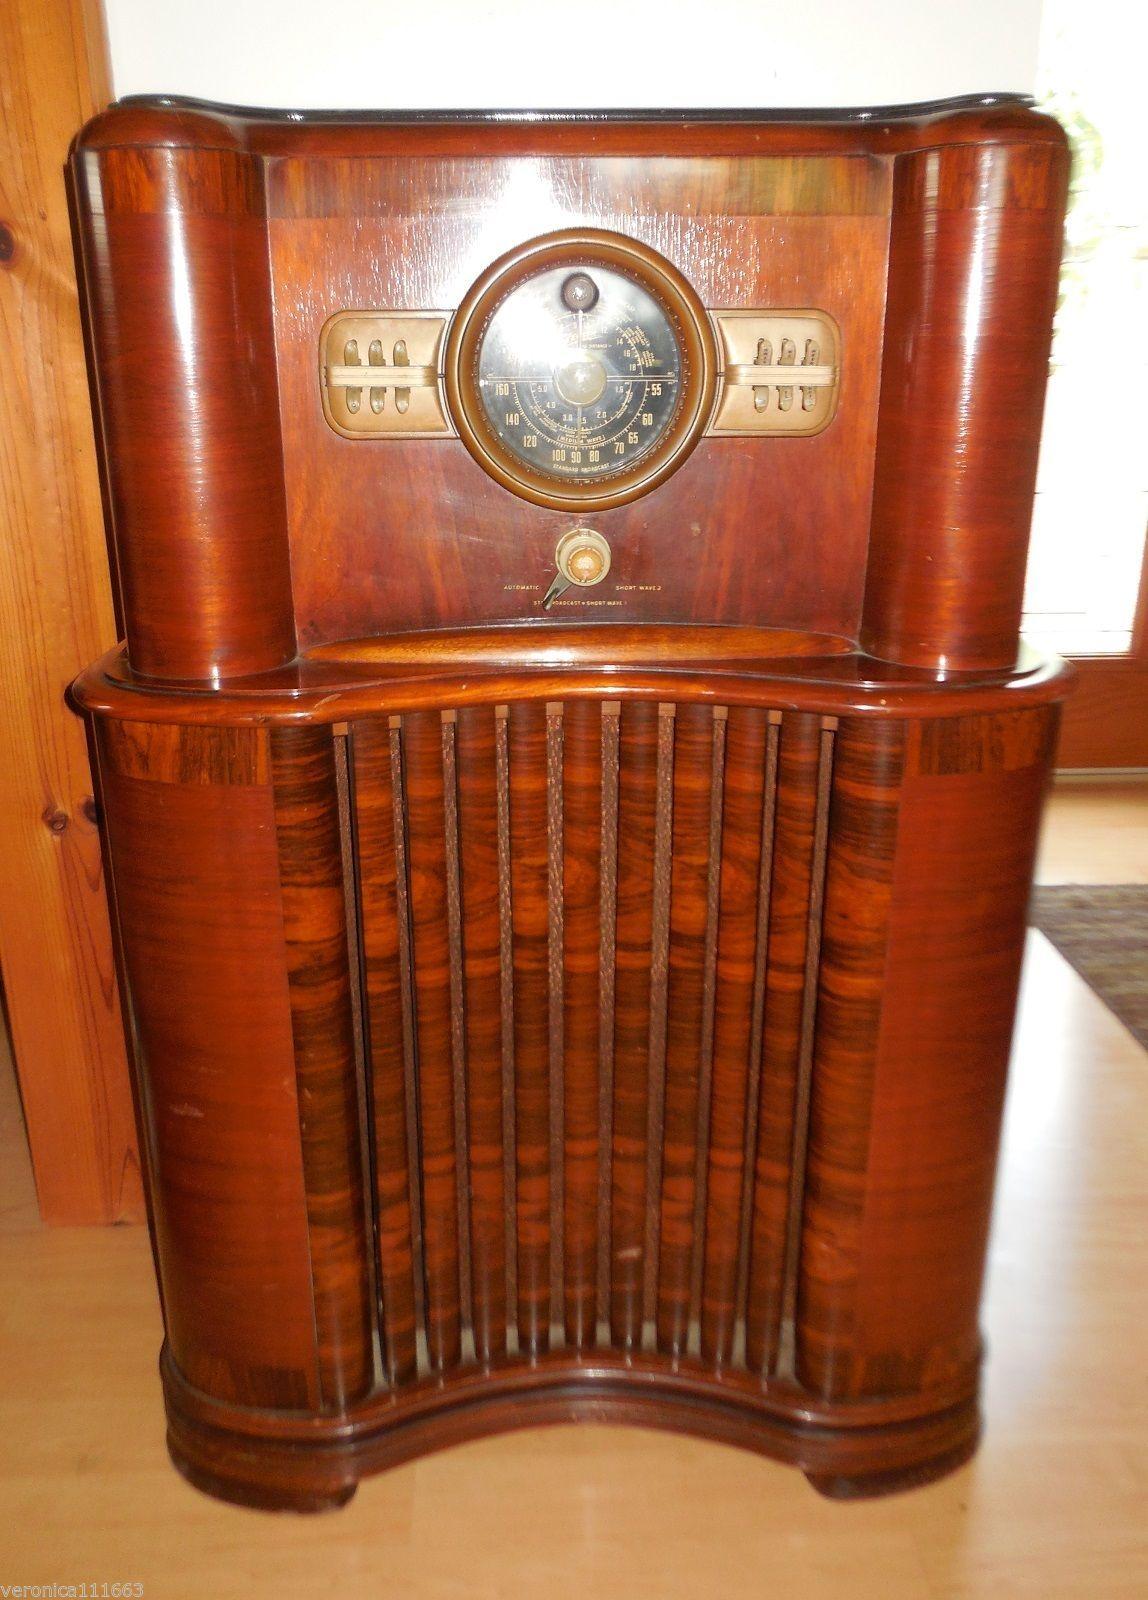 Genuine Zenith Console Radio Vintage 1940 Floor Model 8 S